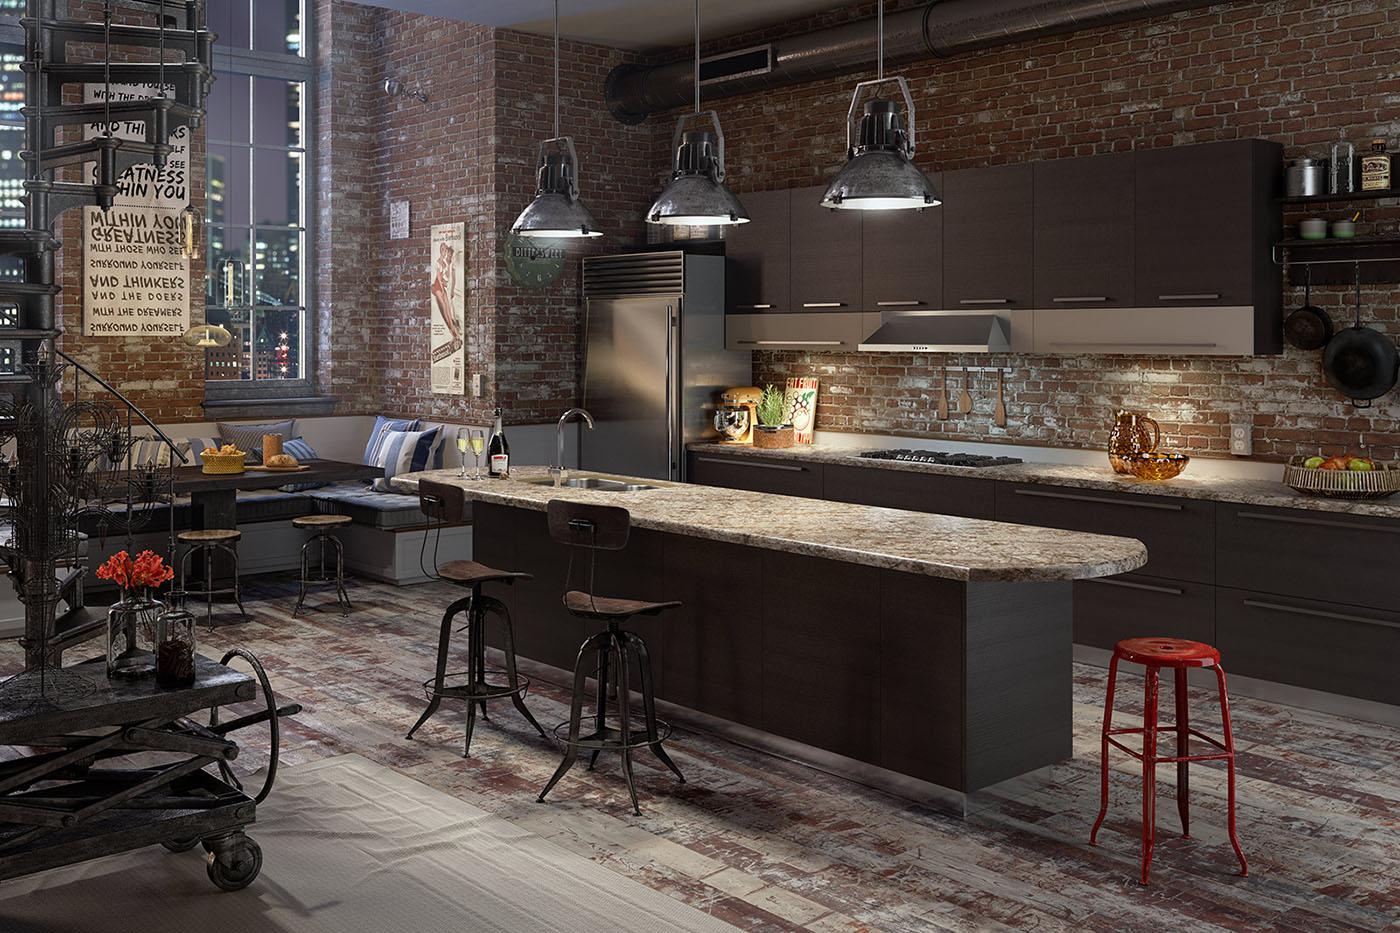 kitchen_loft_camera01